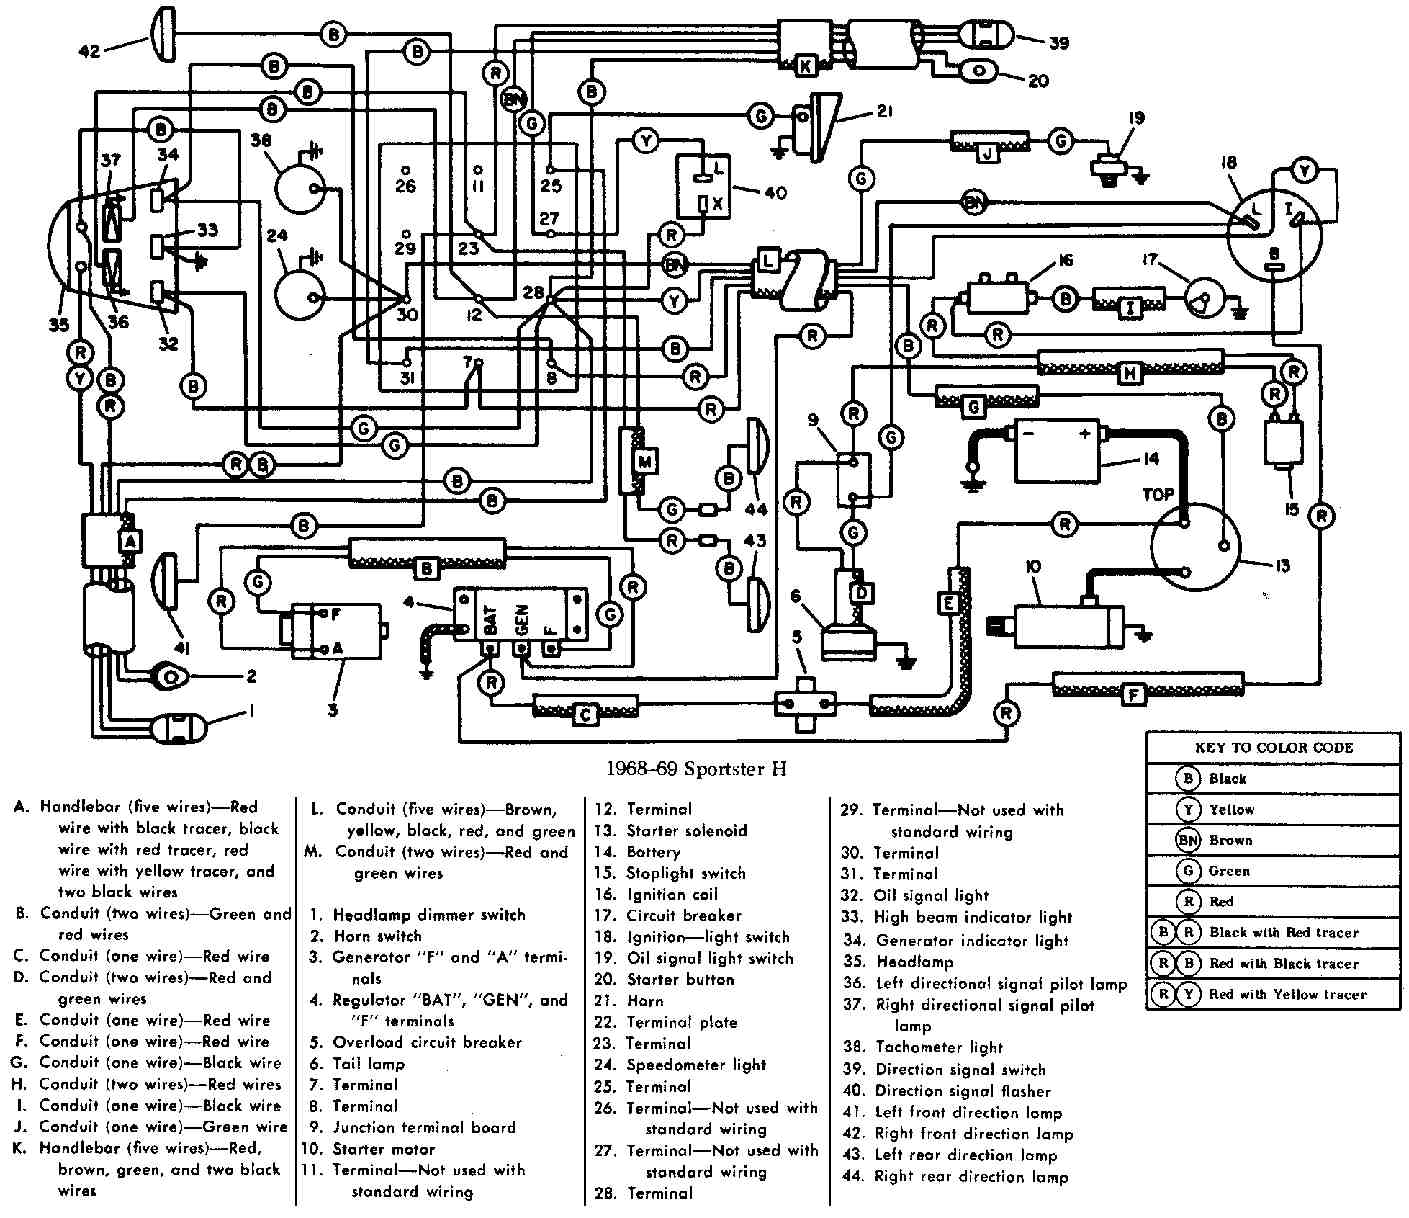 harley davidson motorcycle wiring diagram 2002 19 5 combatarms1998 harley davidson wiring diagram wiring library rh 20 aboutinnocent org 2002 harley sportster 1200 custom harley ignition switch wiring diagram